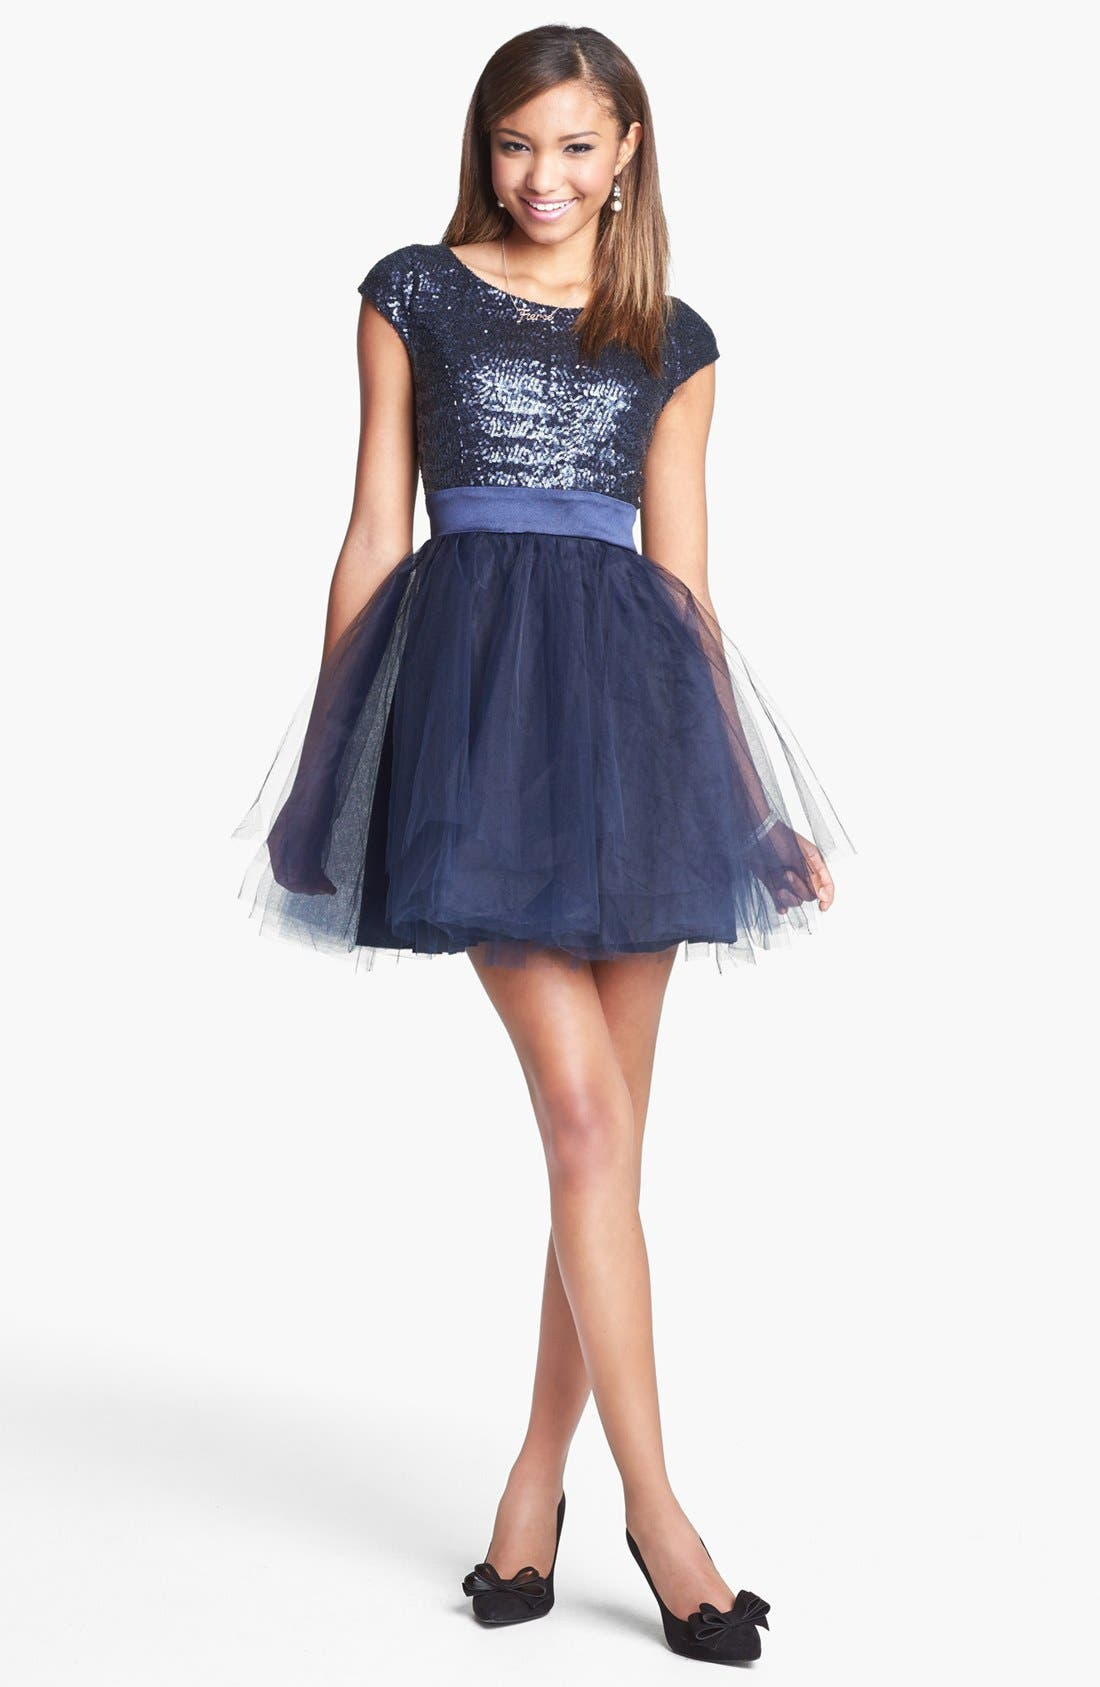 TRIXXI, Sequin & Tulle Party Dress, Main thumbnail 1, color, 400